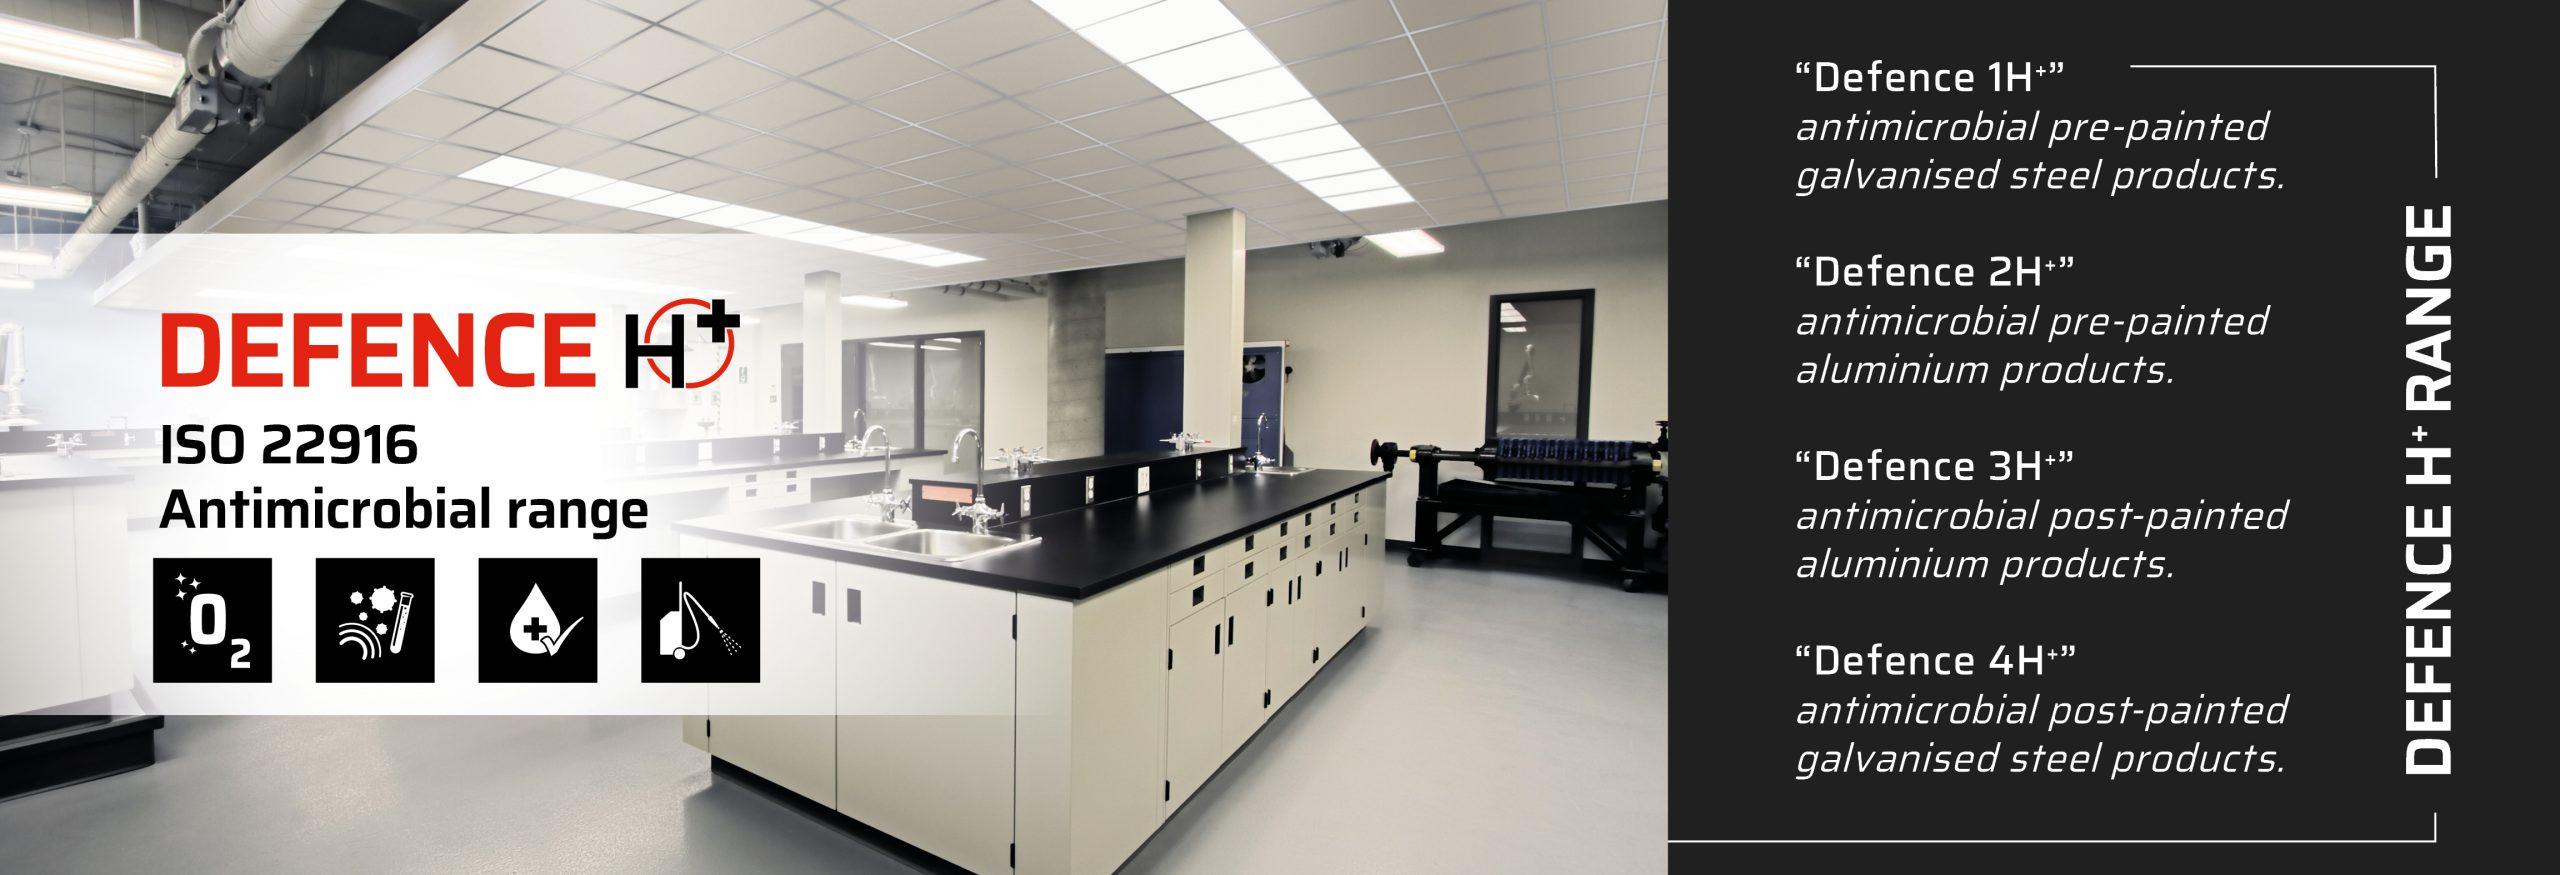 Controsoffitti gamma antimicrobica | Antimicrobial metal ceiling range